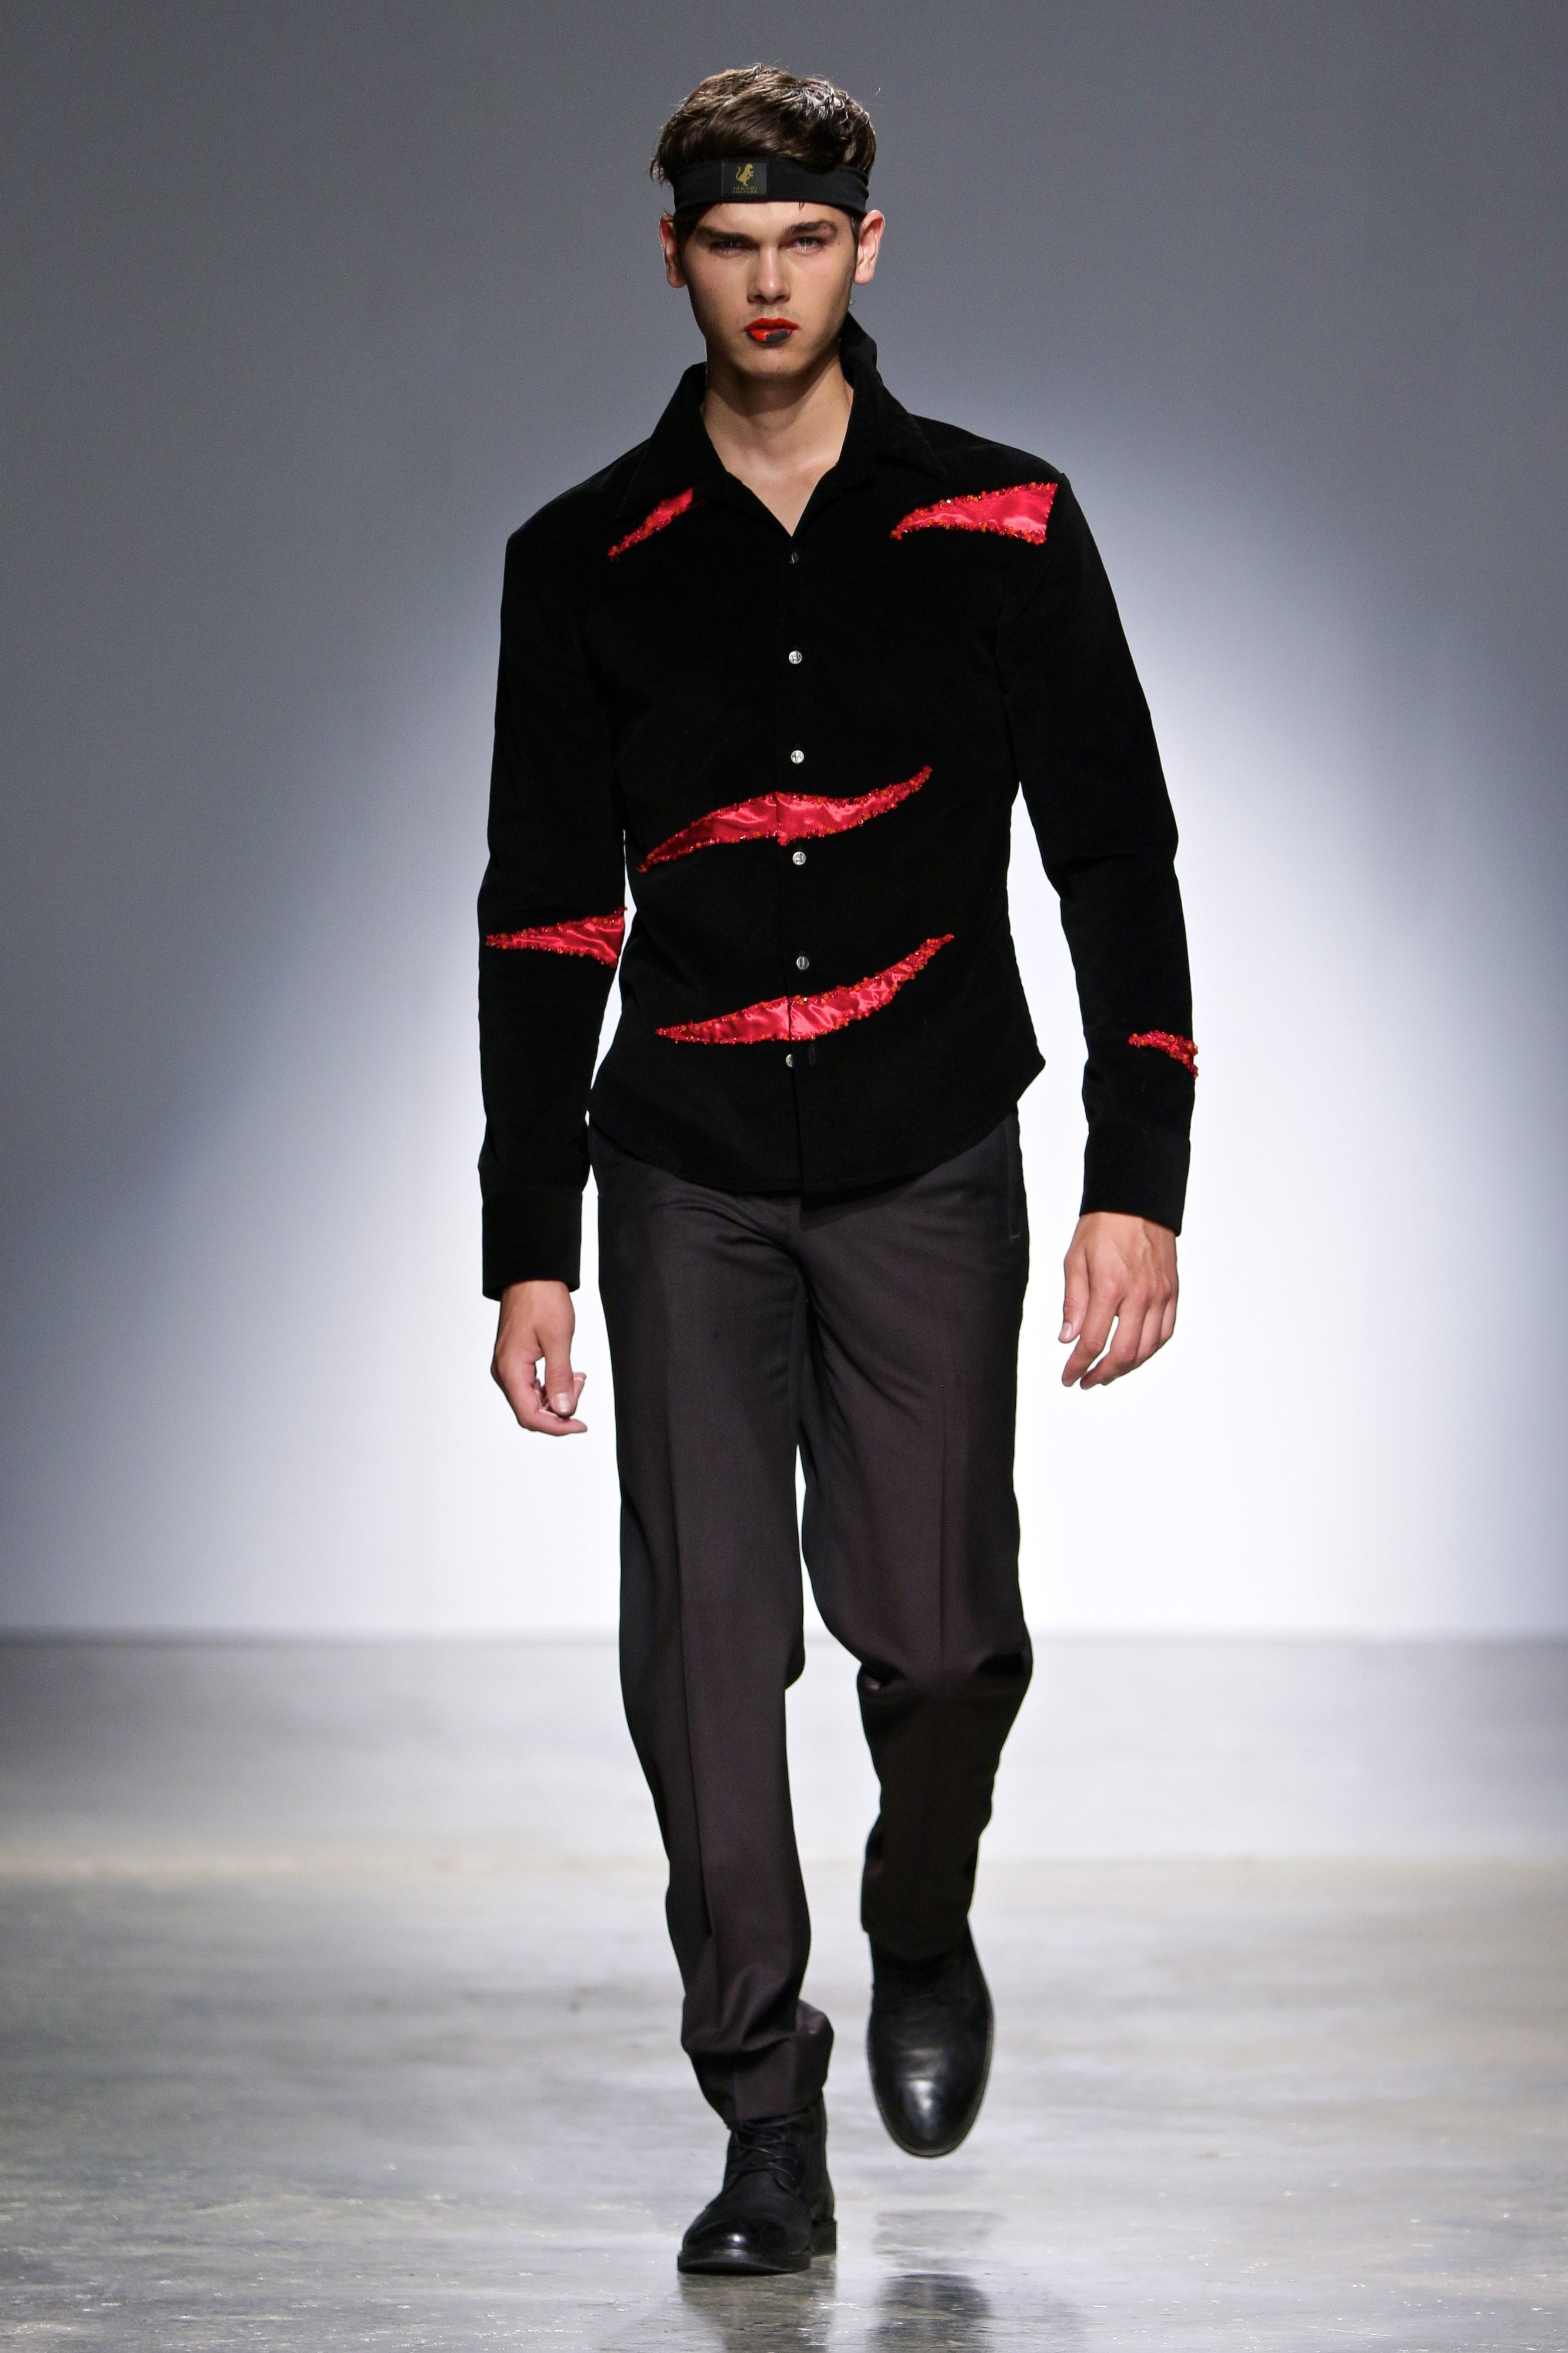 2016 SA Menswear Week AW16  Jagadi Man  Otoño Invierno -#Menswear #Trends #Tendencias #Moda Hombre #Africa - SDR